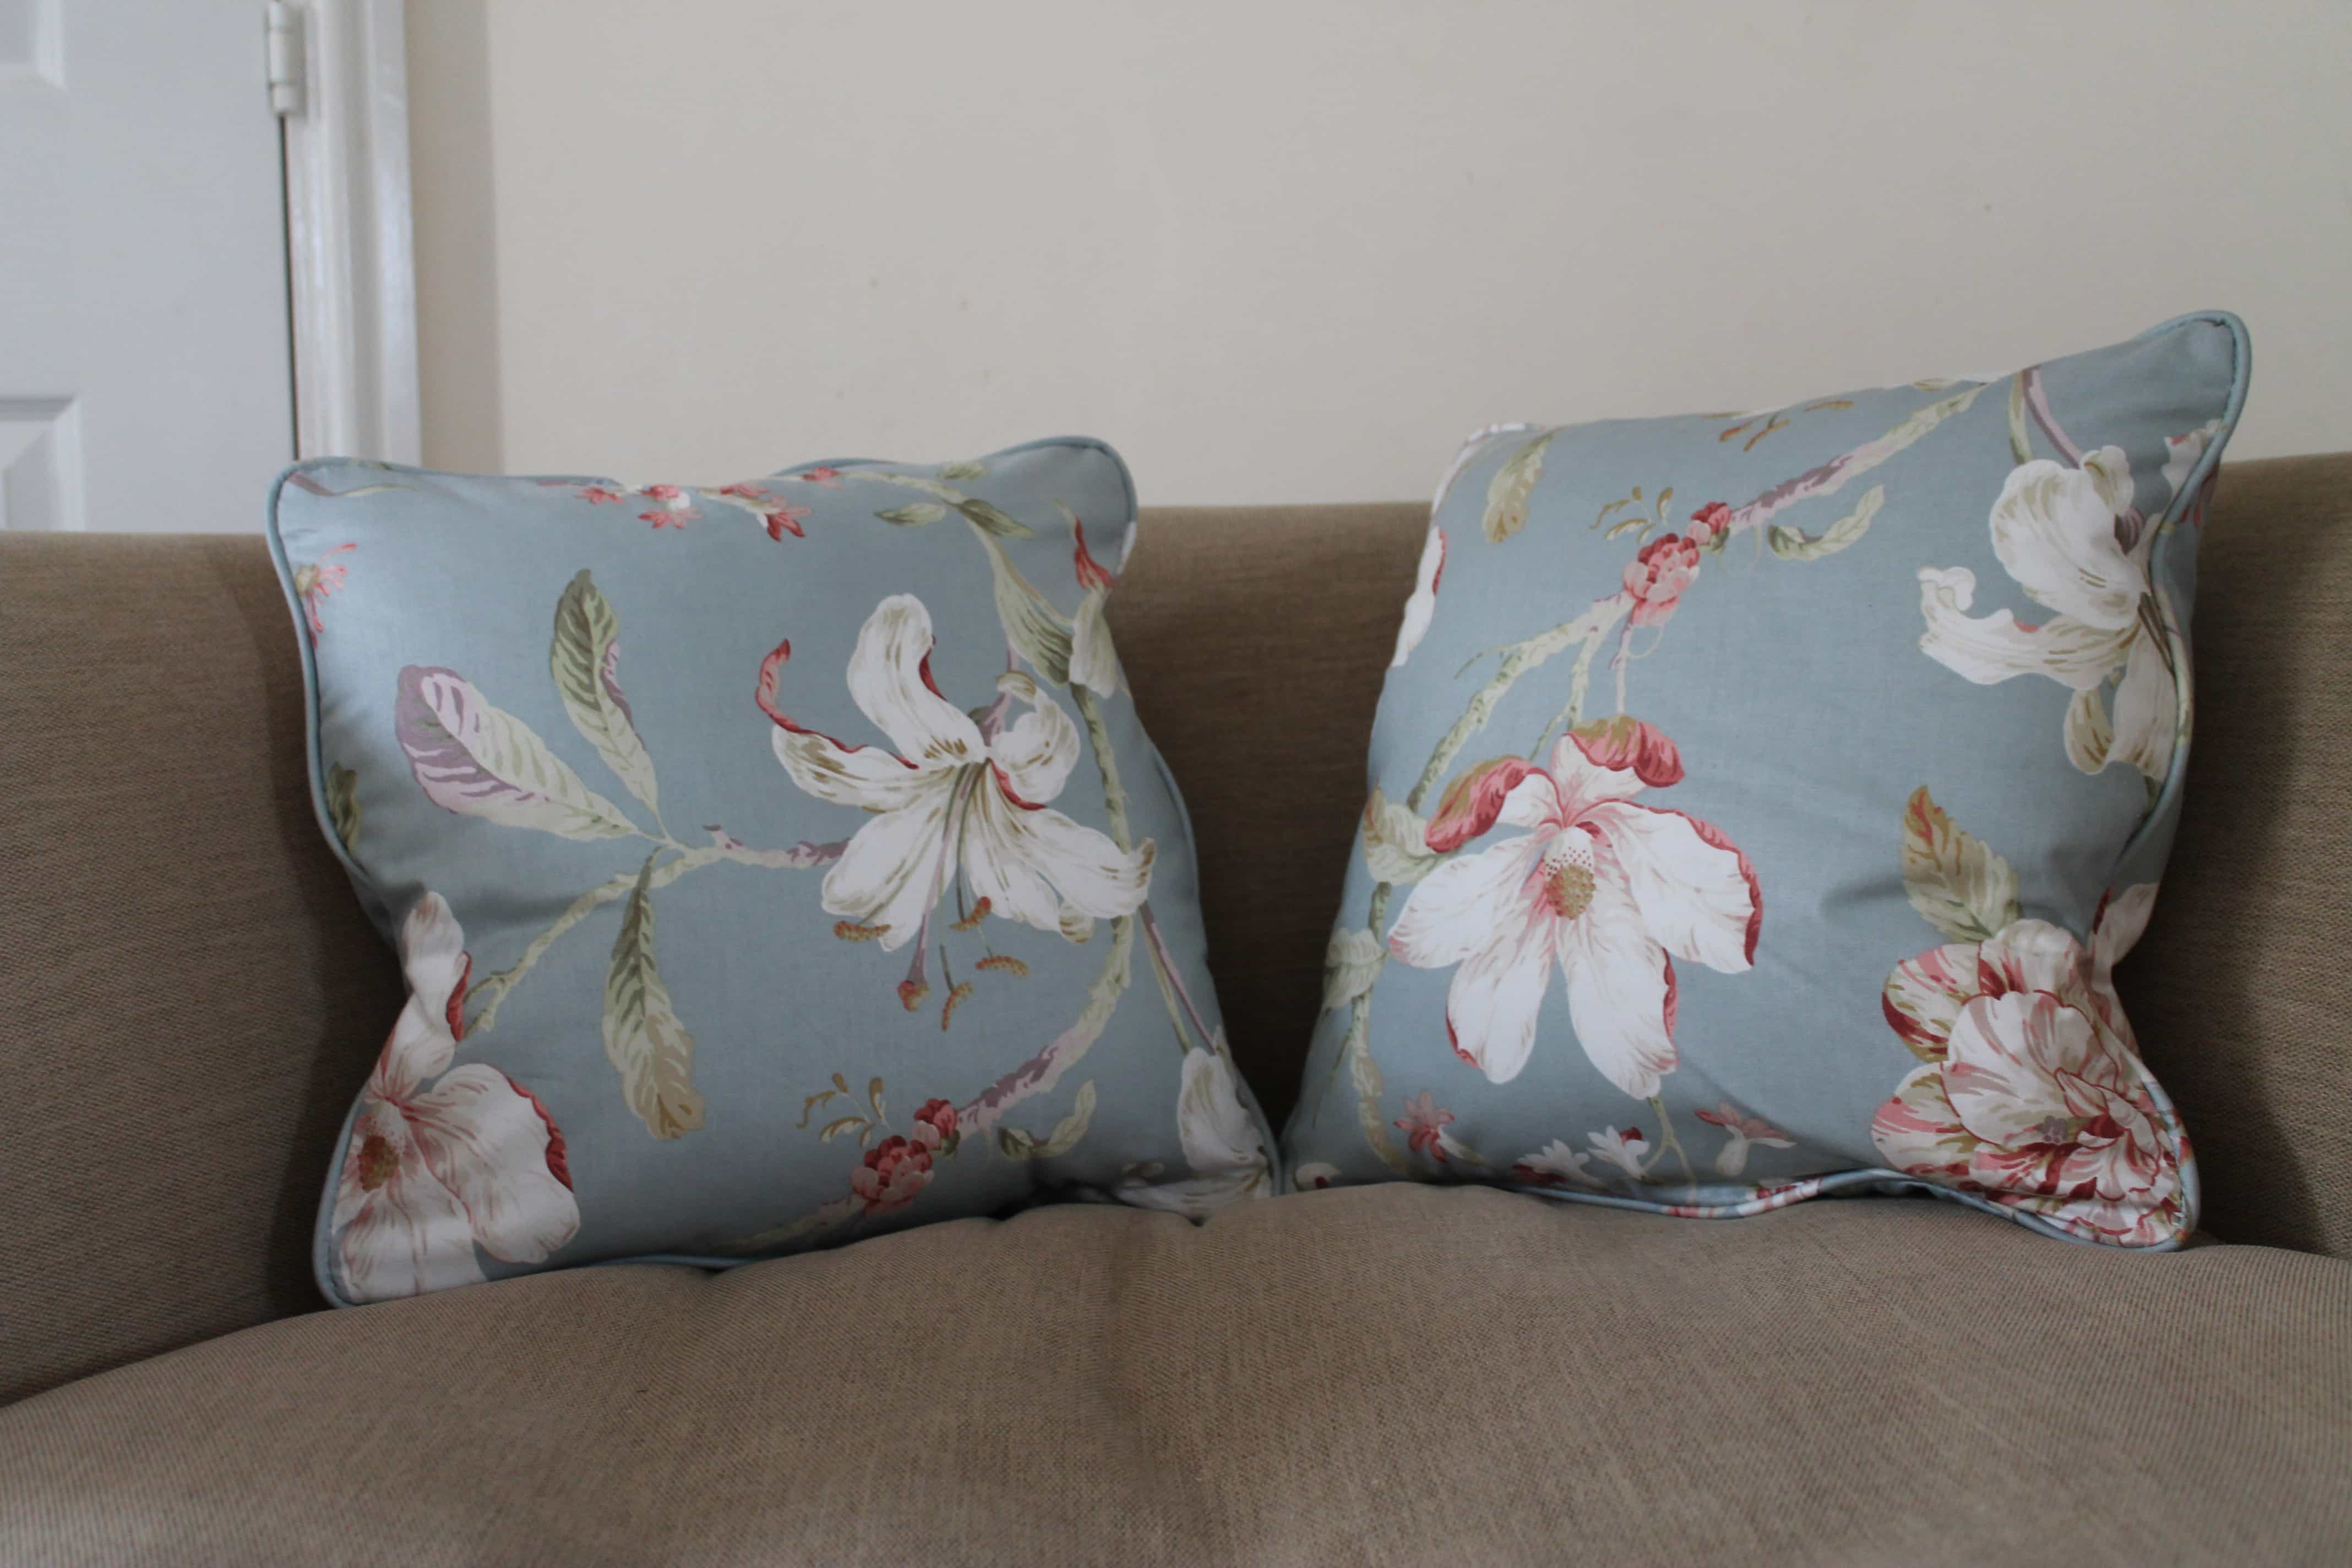 sofasofa reviews sofa cover ikea malaysia review scatter cushions twinderelmo